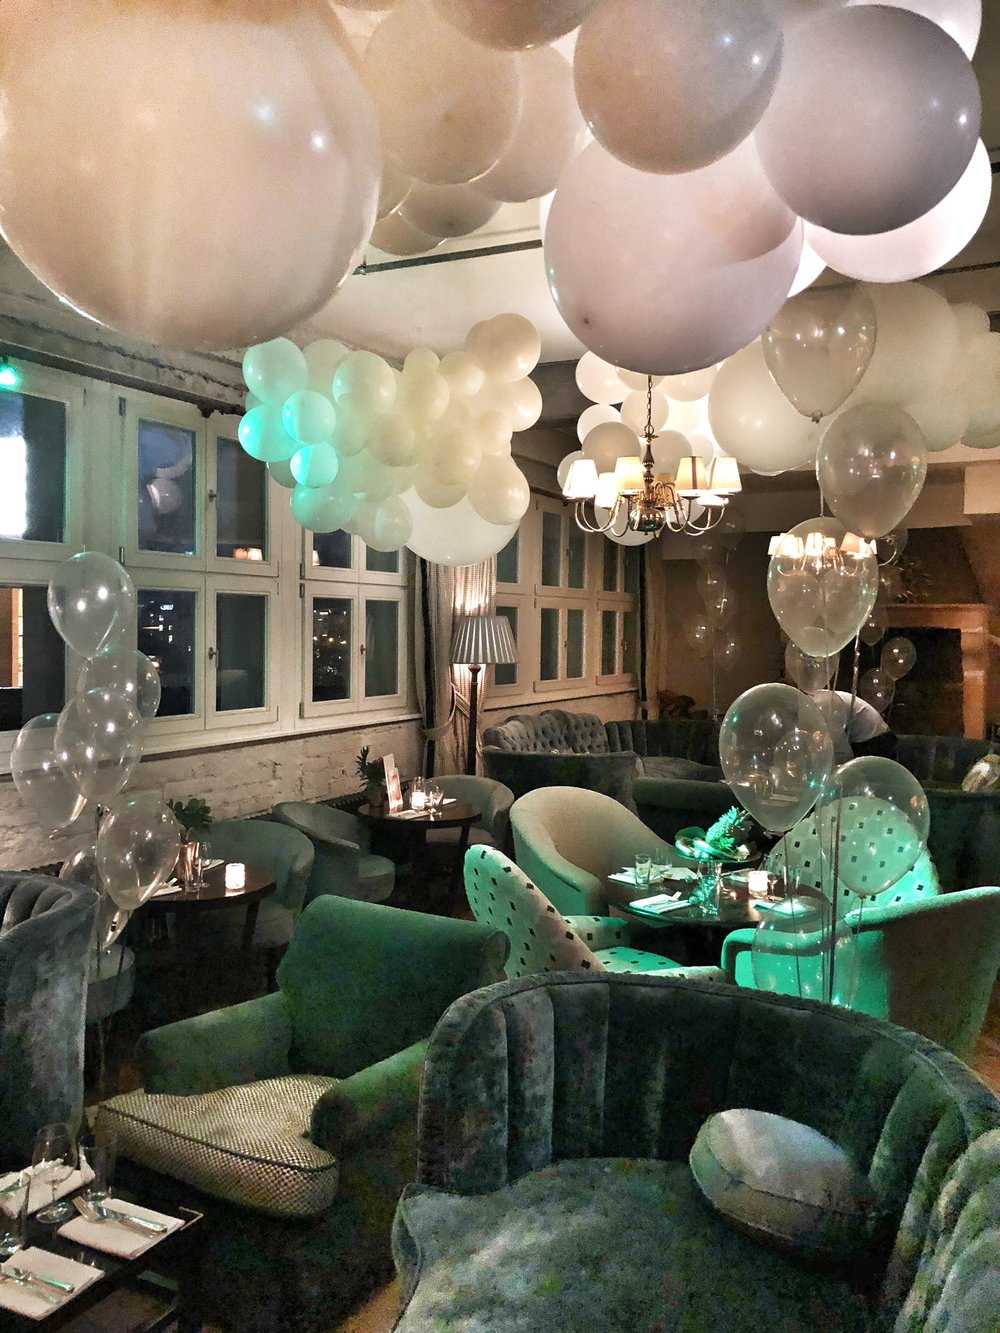 Soho House NYE Balloon Clouds Surrealist ball